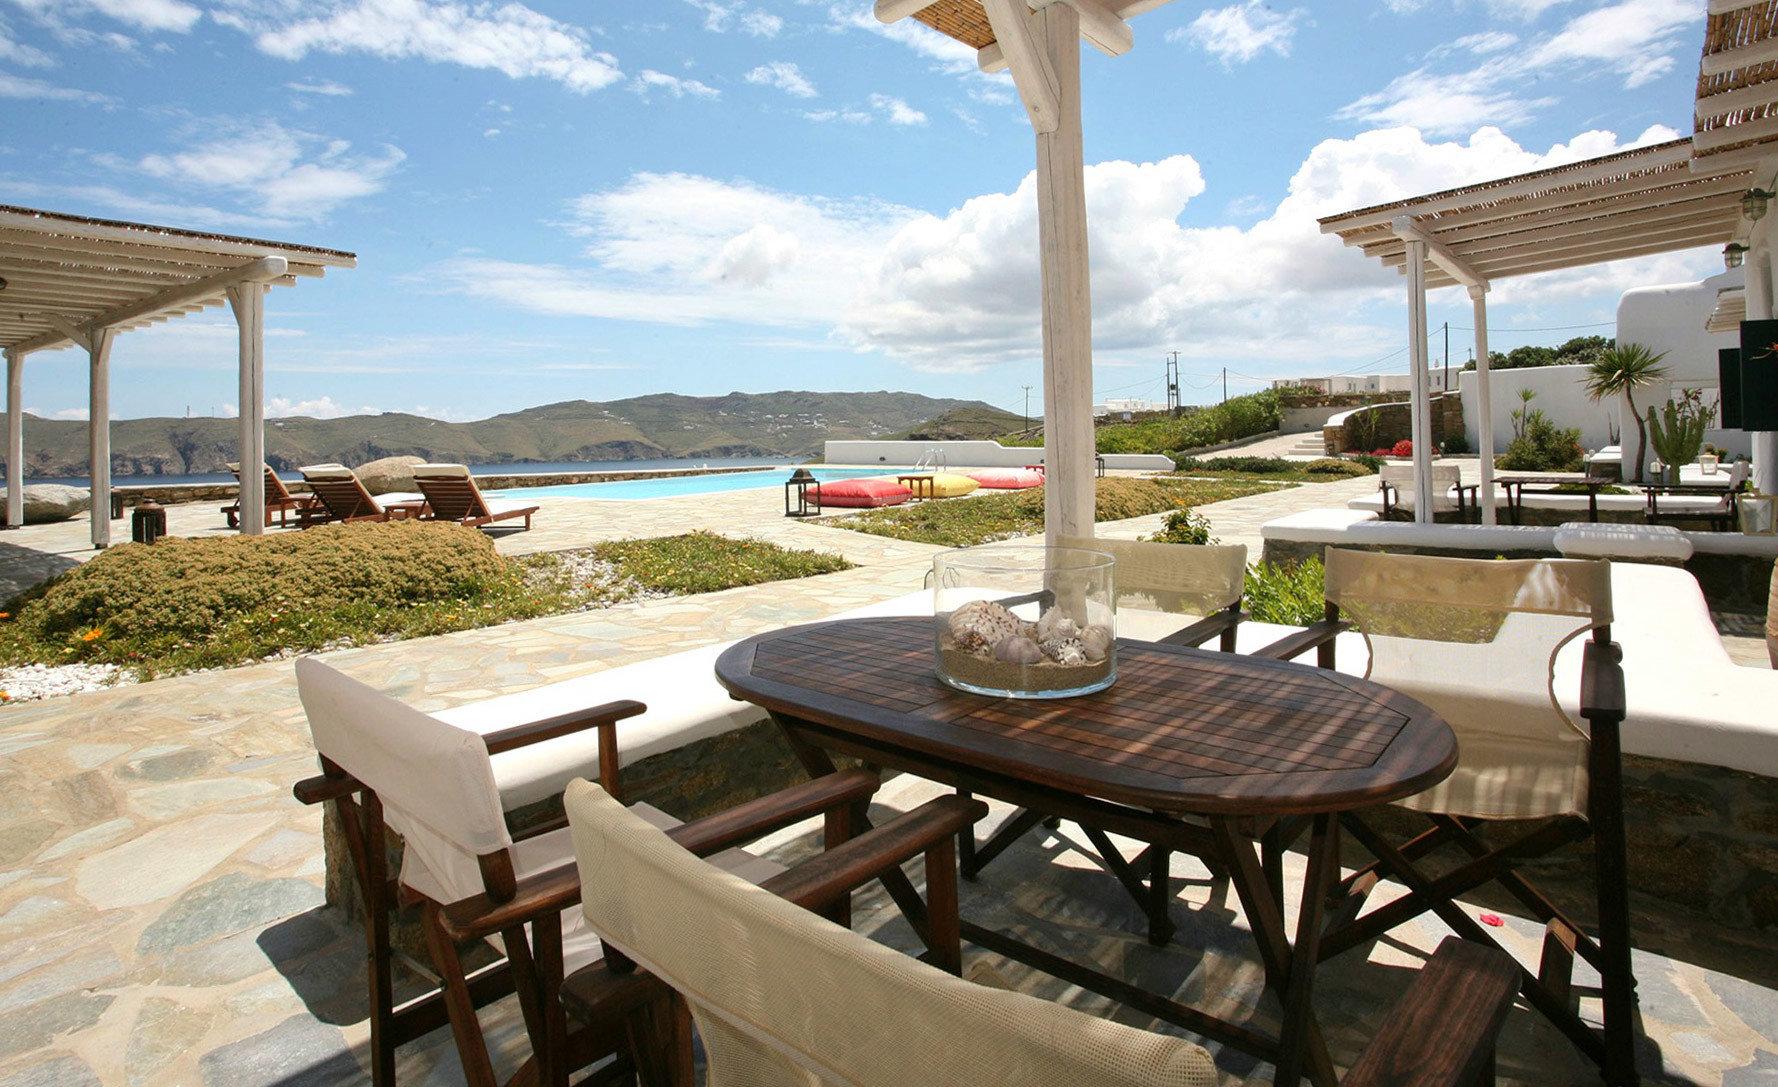 sky property Resort restaurant Villa condominium cottage home Deck day Island